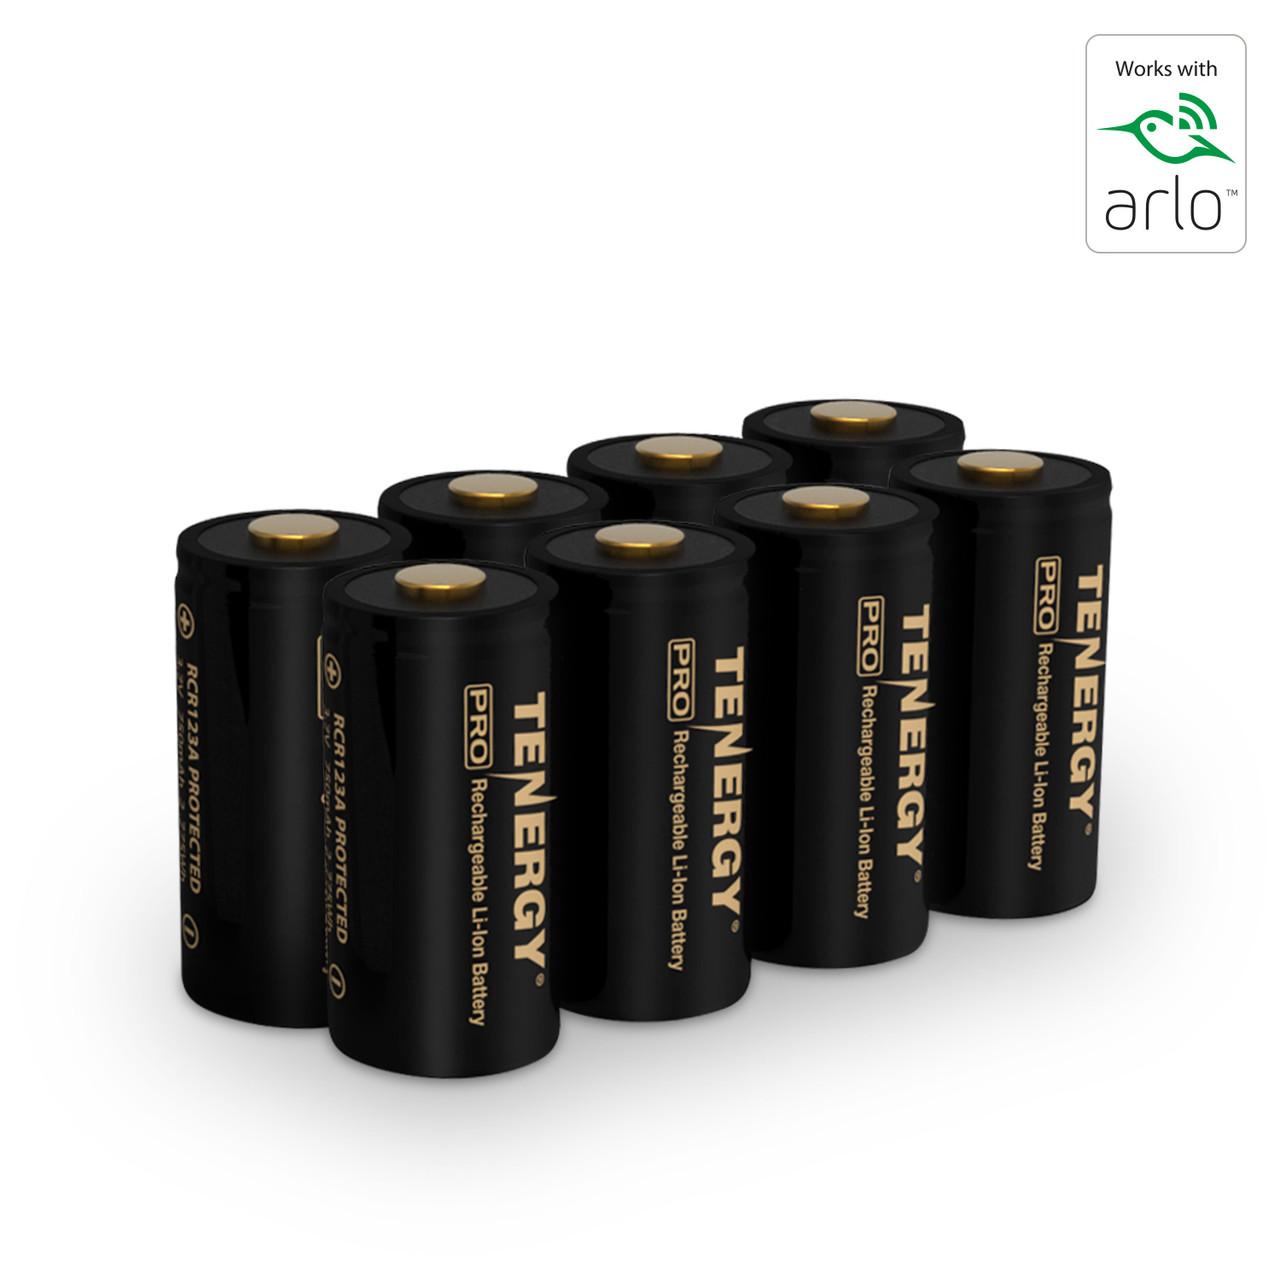 Premium High Capacity Rechargeable Batteries (8-Pack) Arlo Certified Li-ion 3.7V 750mAh